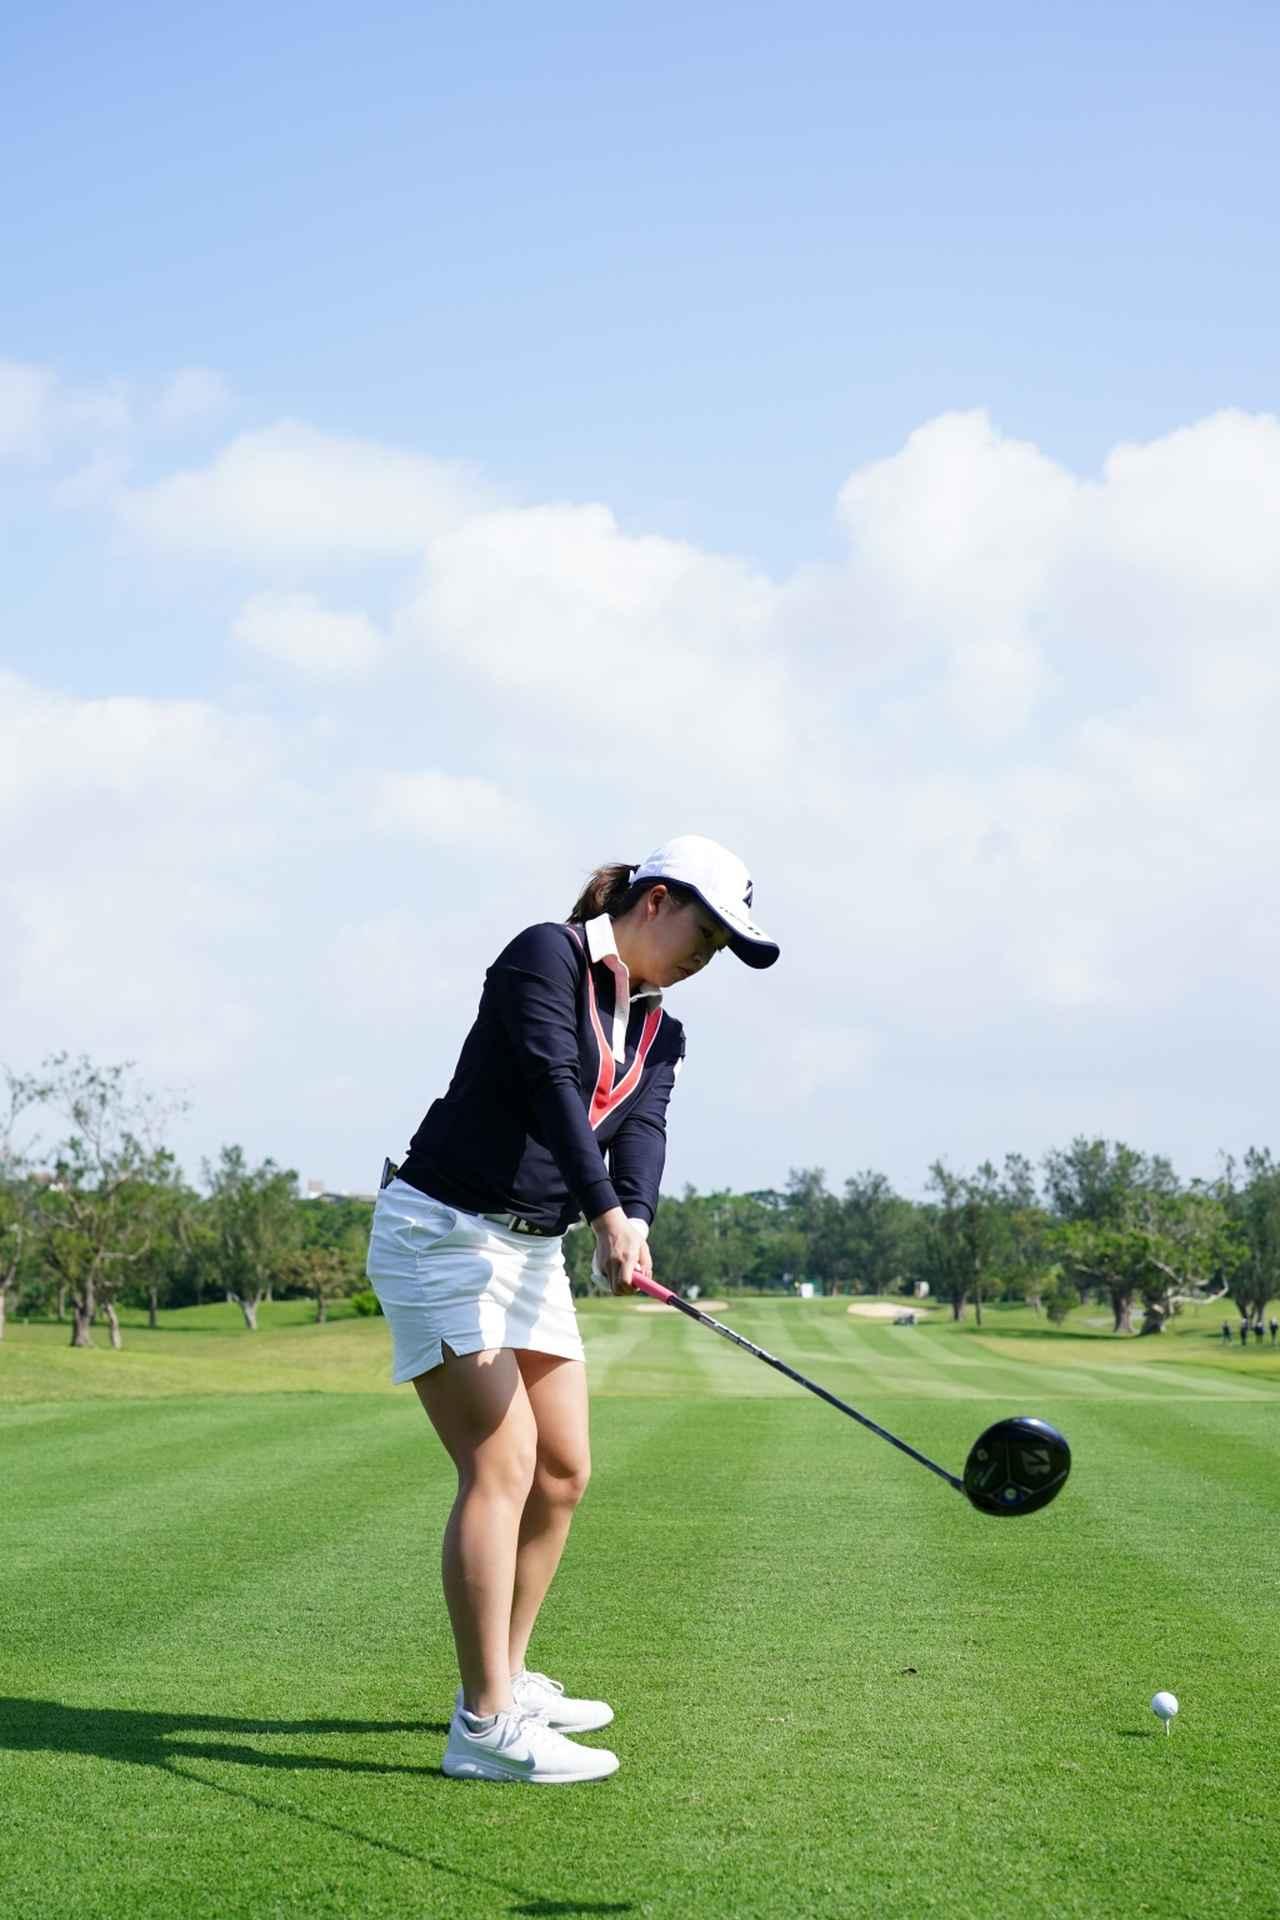 Images : 2番目の画像 - 丹萌乃のドライバー連続写真 - みんなのゴルフダイジェスト